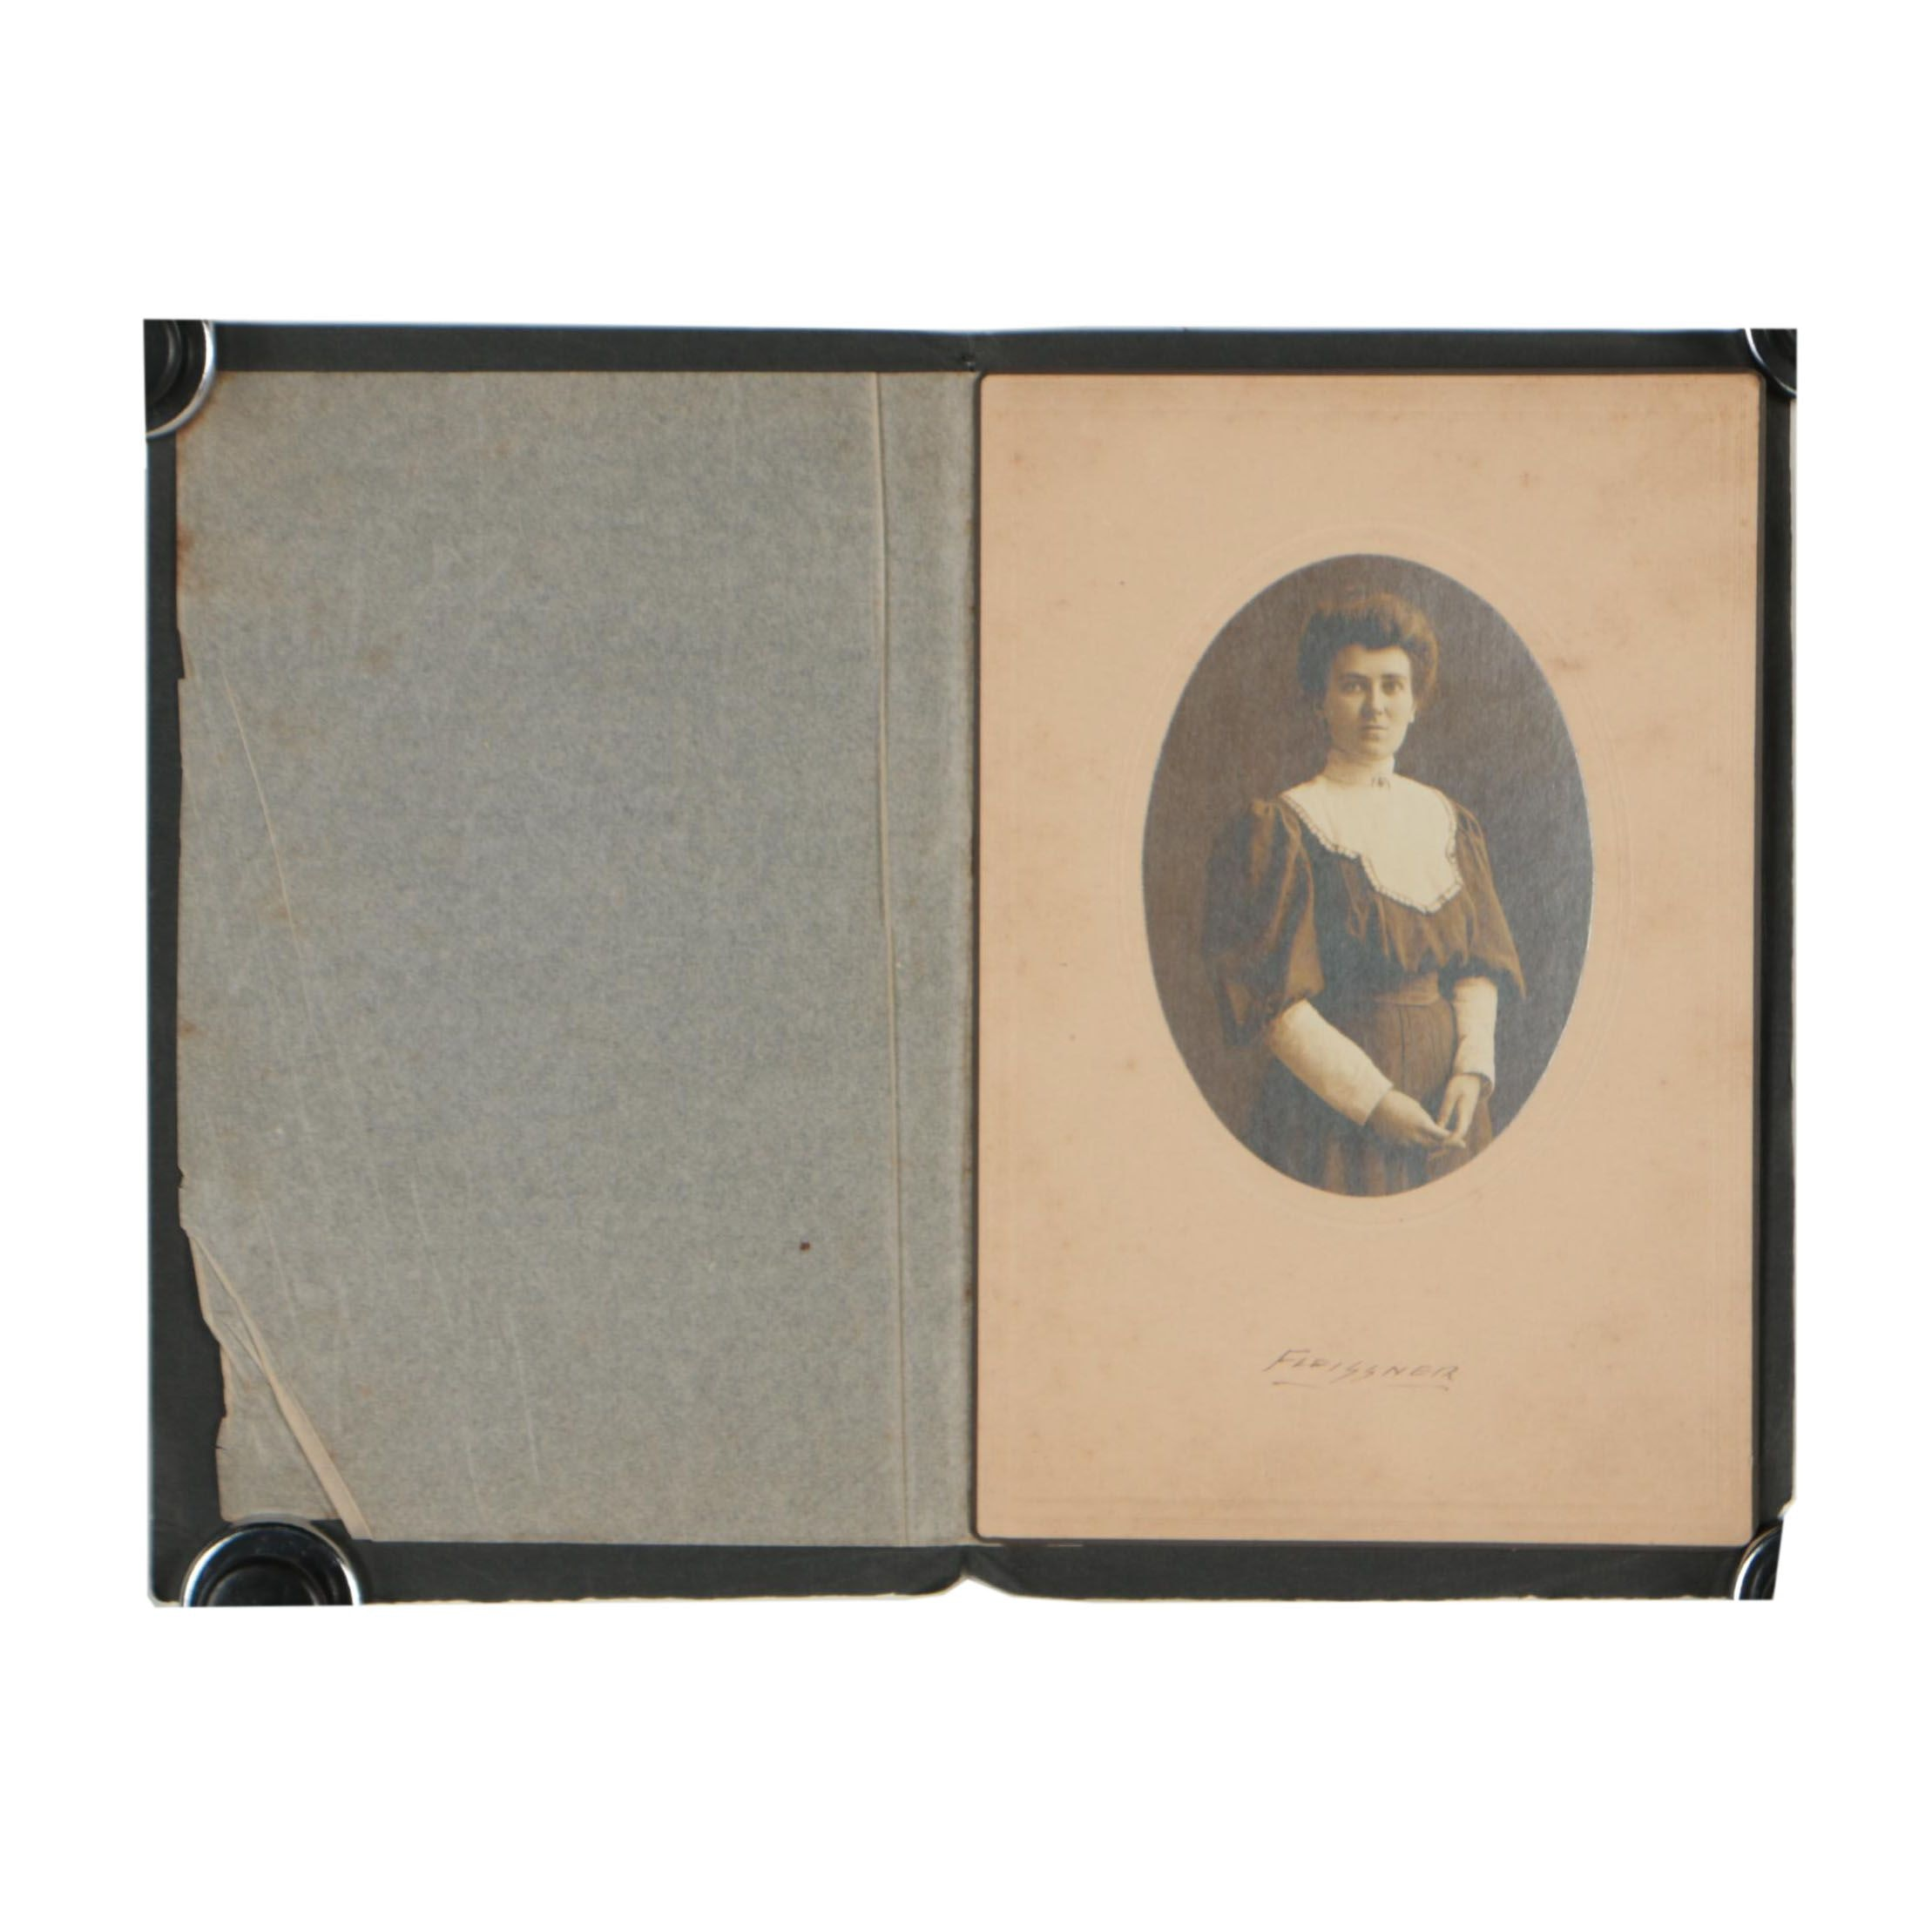 "Late 19th Century Silver Gelatin Photograph ""Fleissner"""